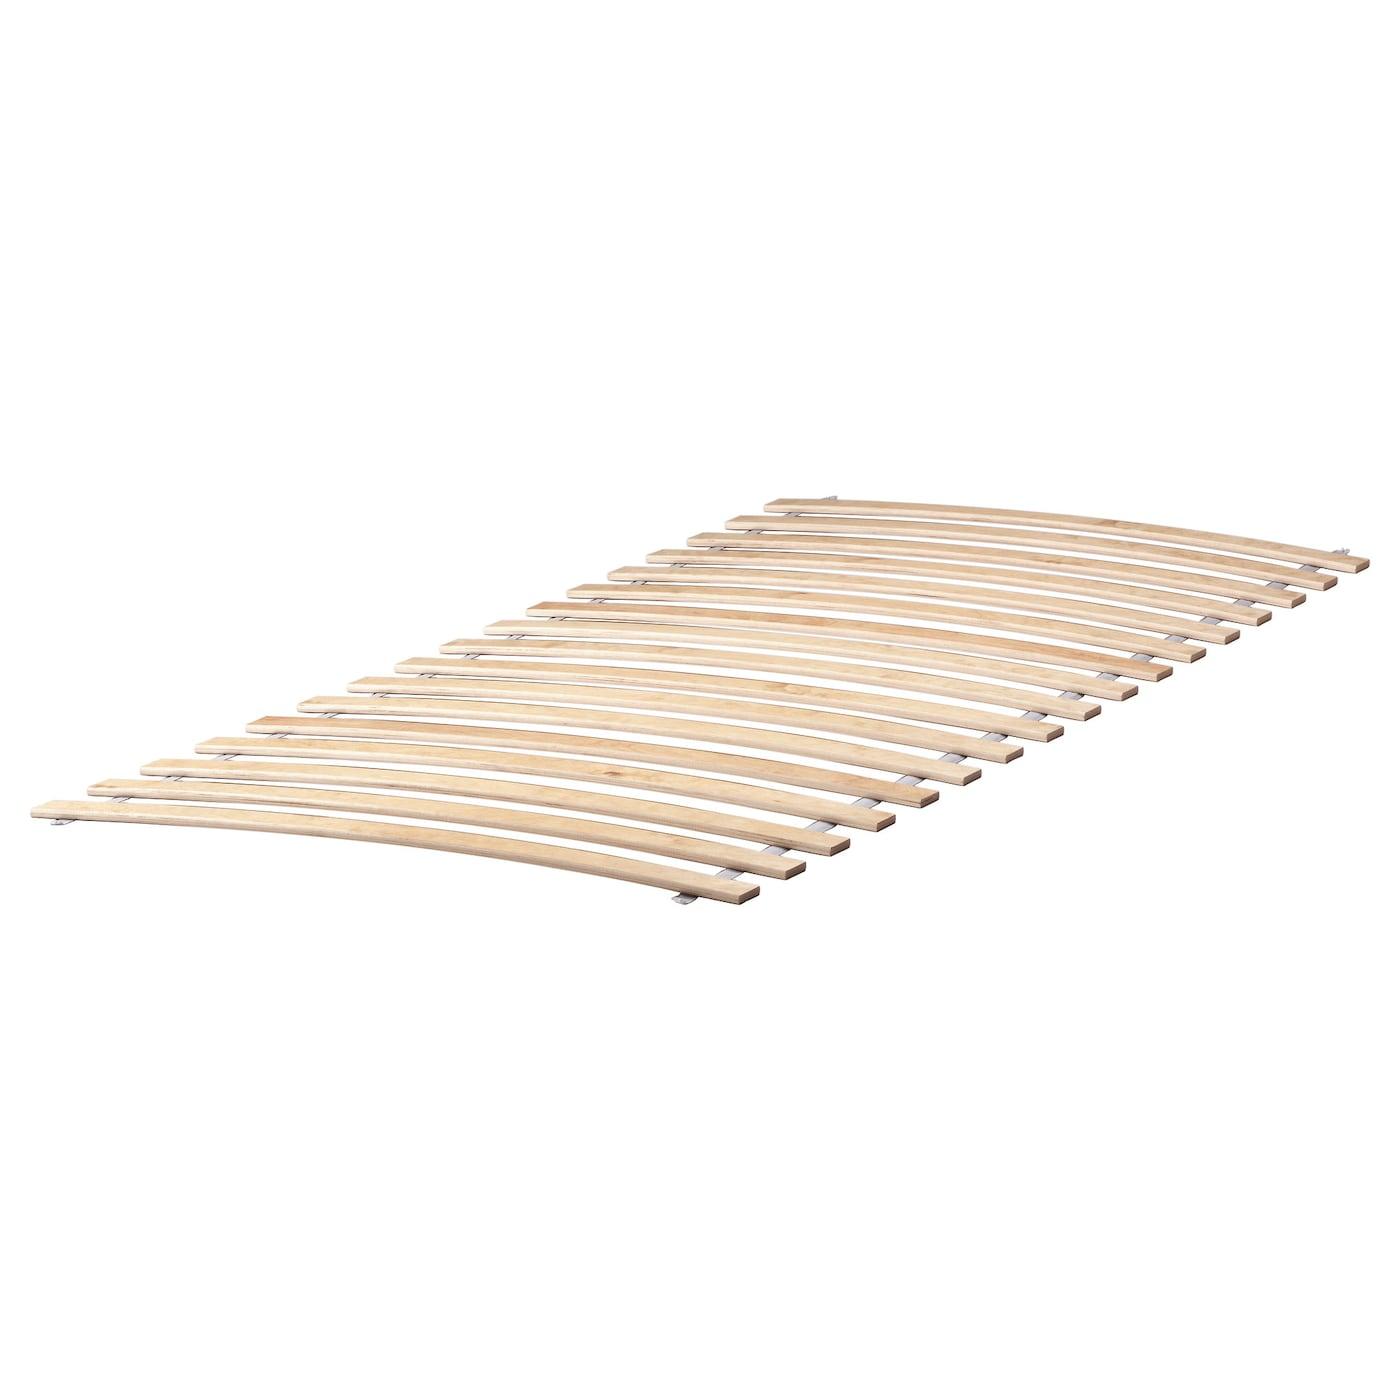 malfors foam mattress firm white 90x200 cm ikea. Black Bedroom Furniture Sets. Home Design Ideas